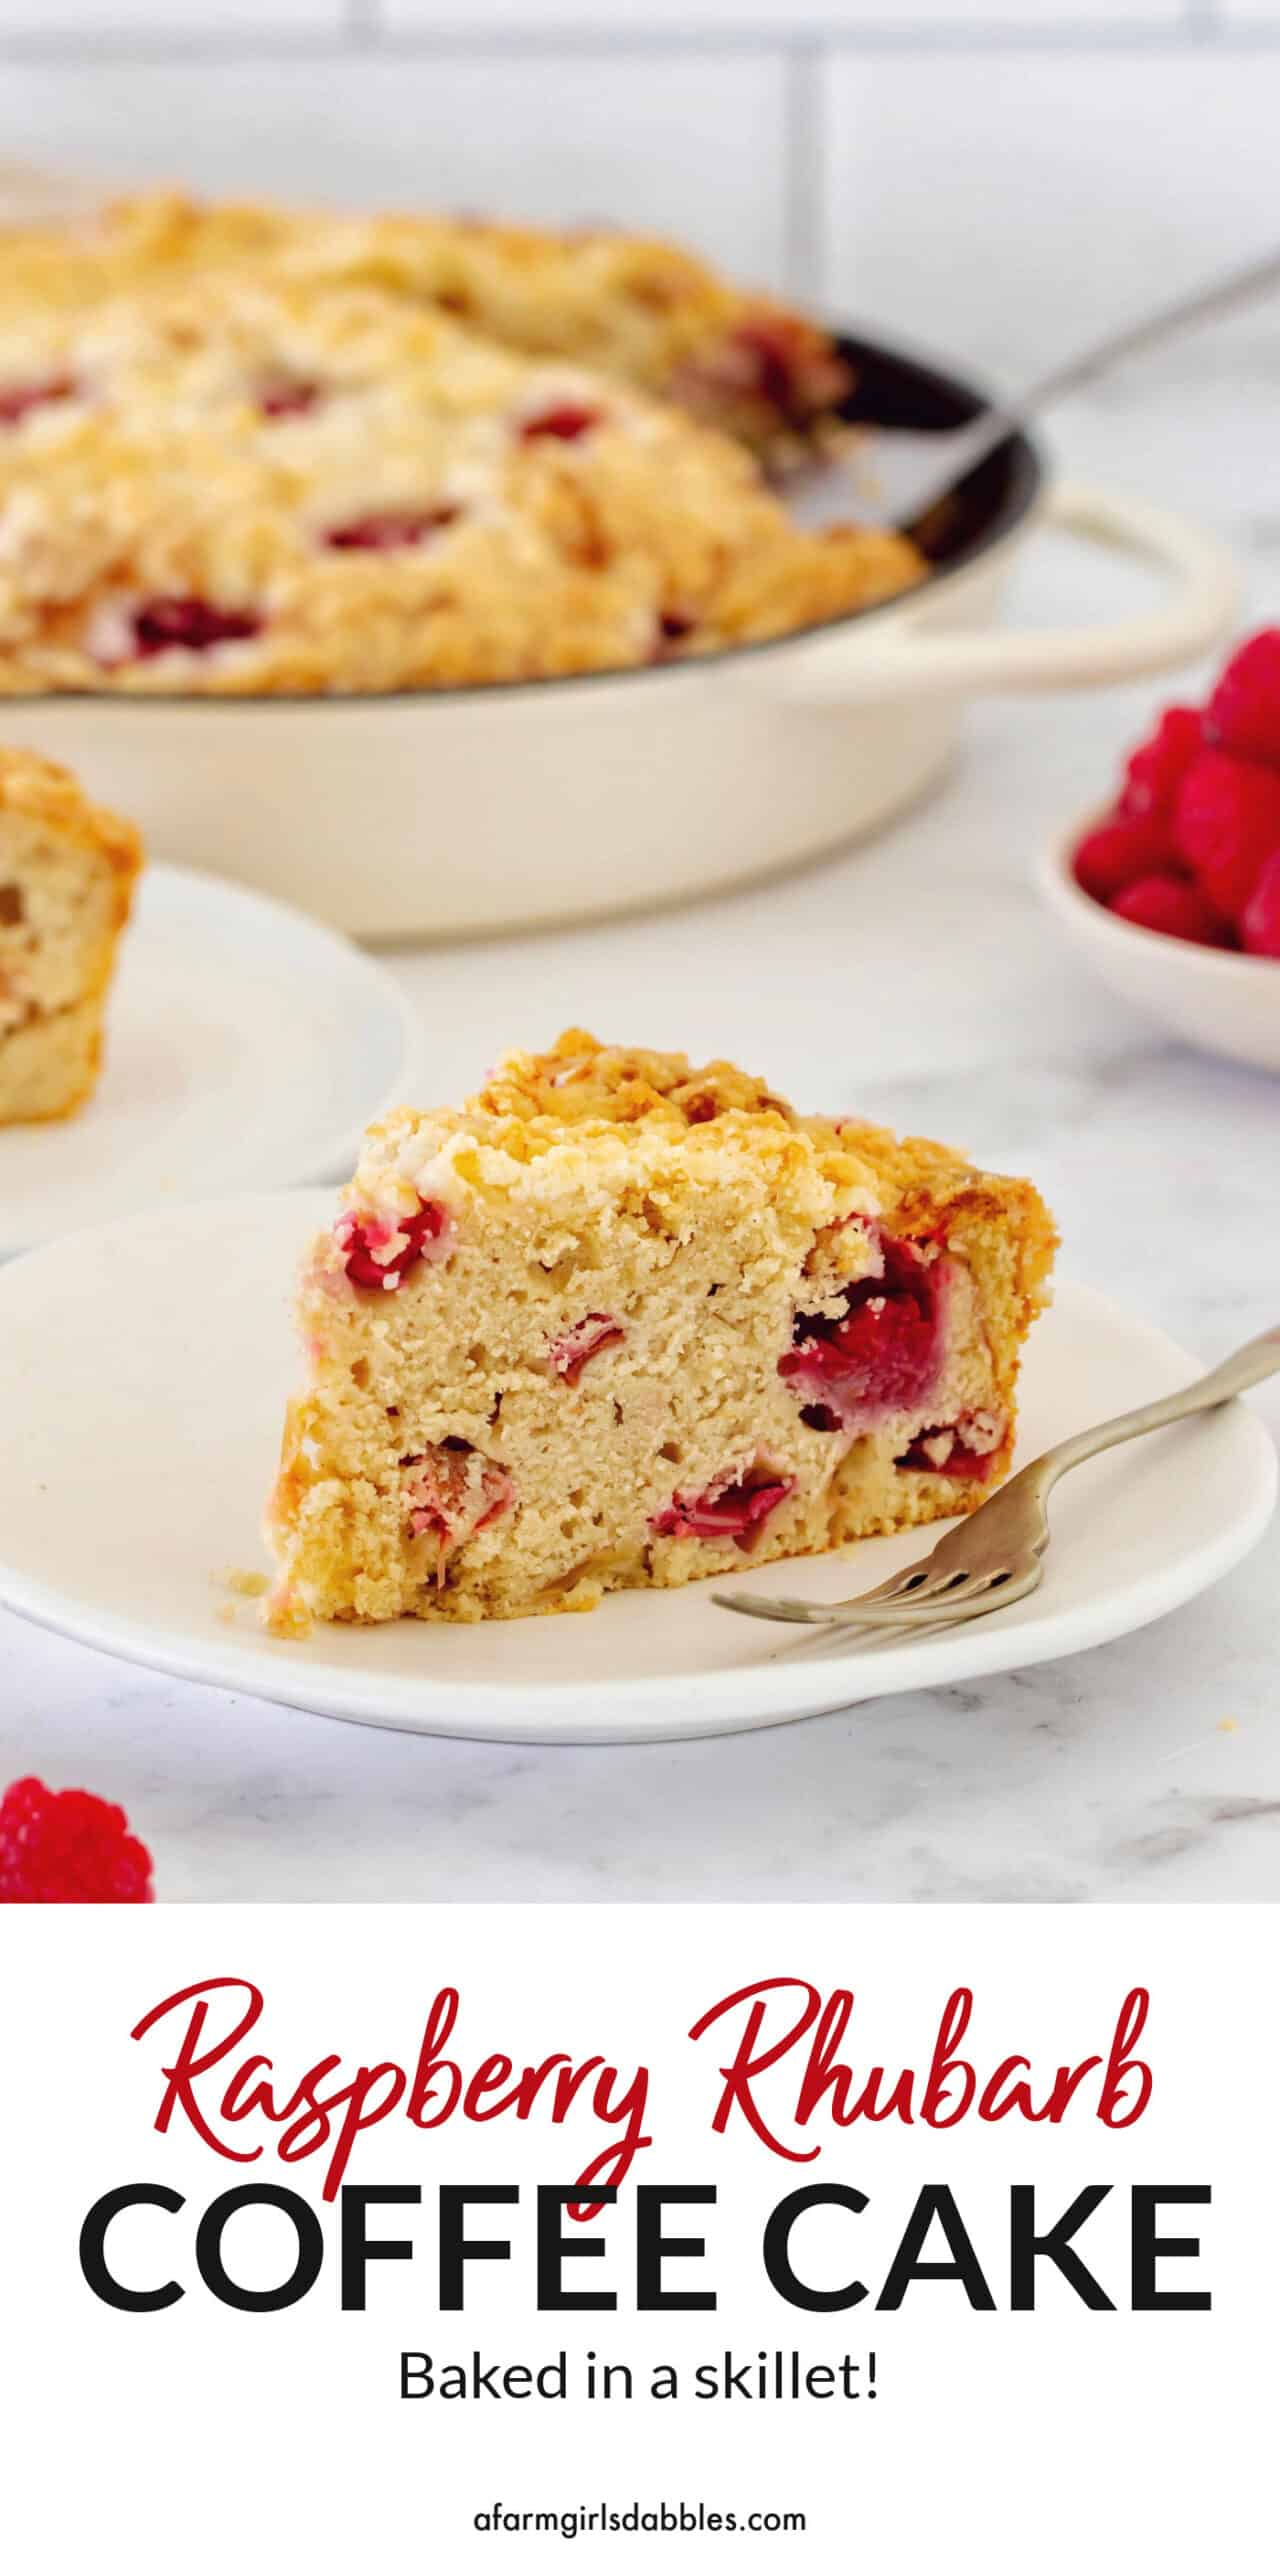 Pinterest image for Raspberry Rhubarb Skillet Coffee Cake